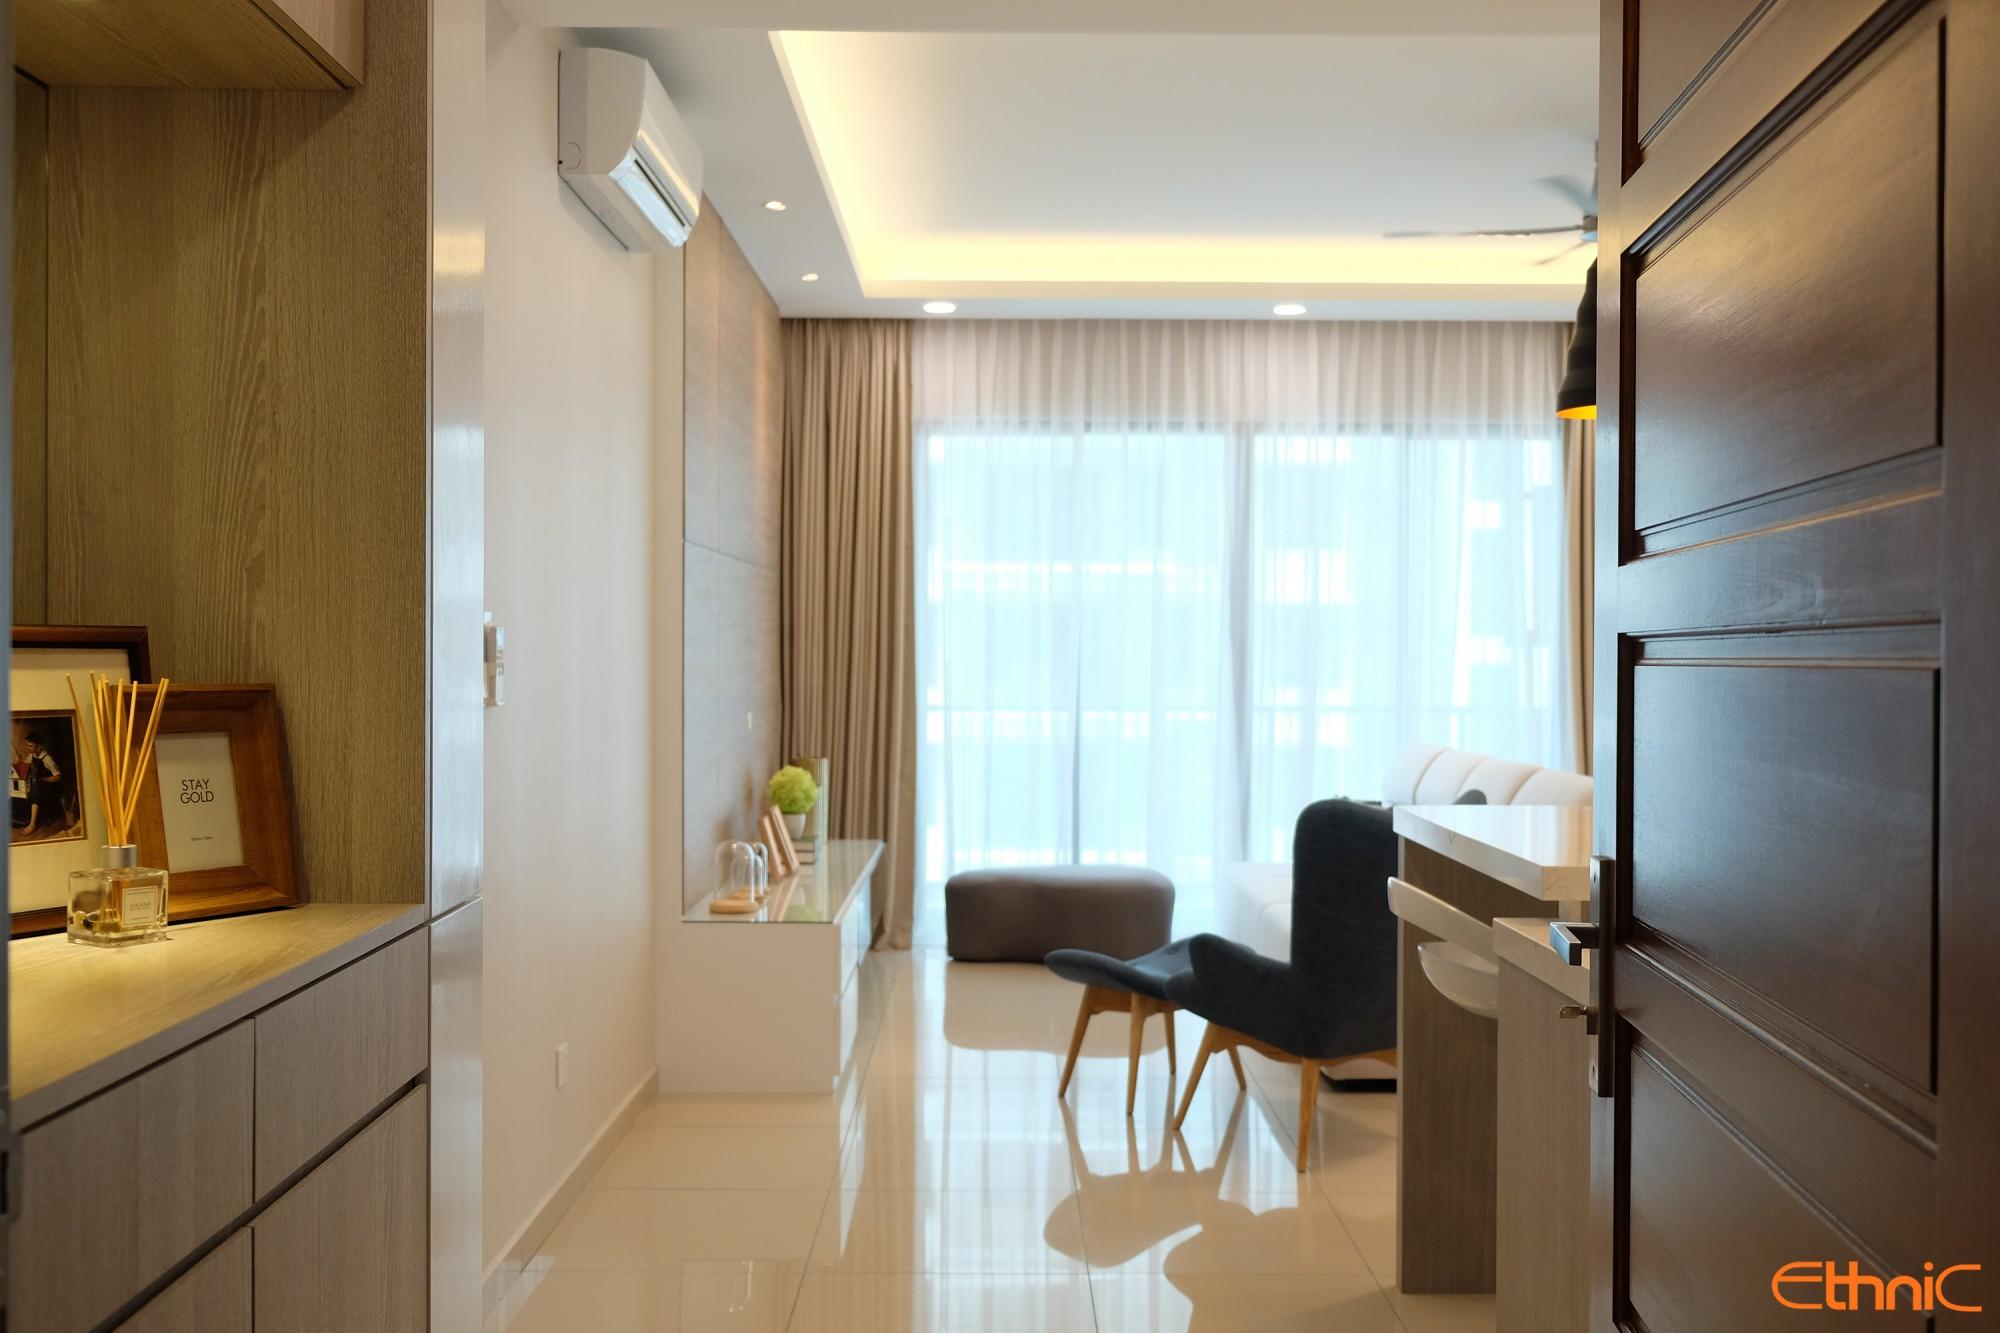 Penang Tree Sparina Interior Design Renovation